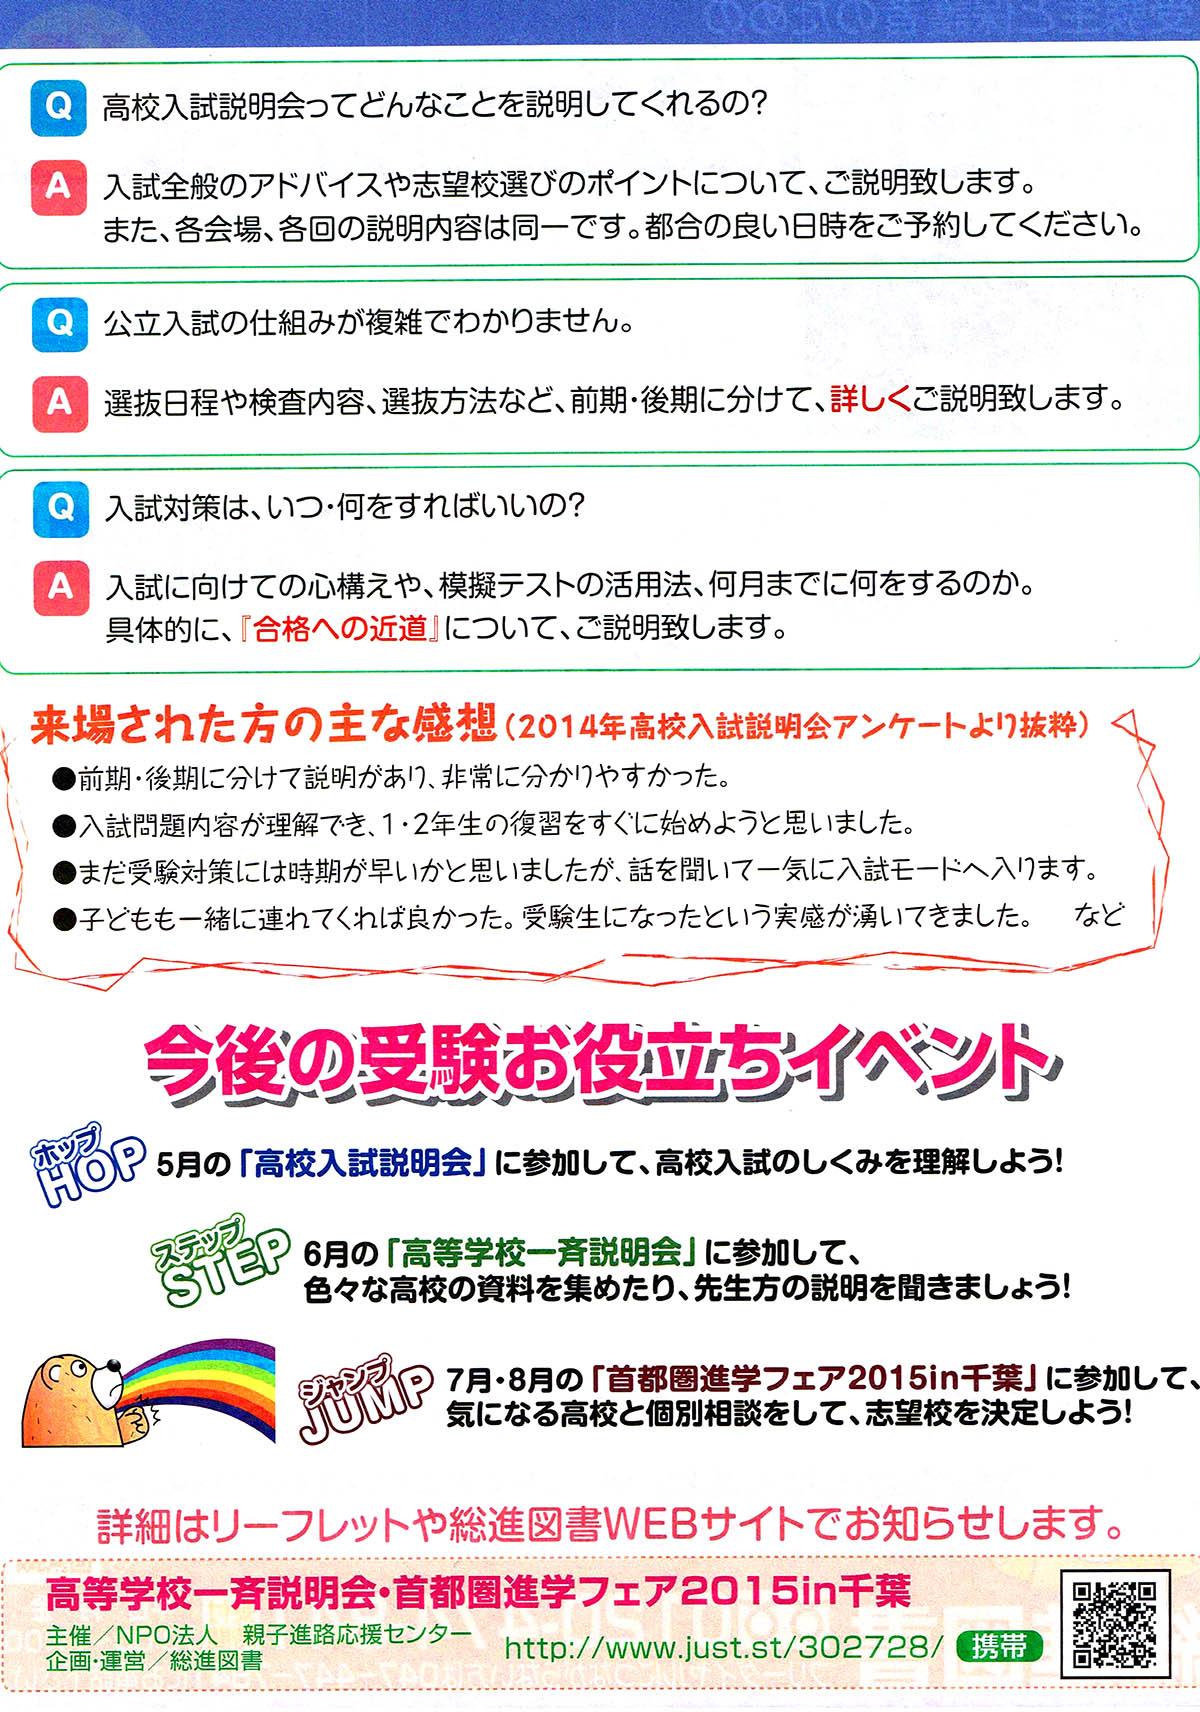 2015入試2015041020150410_0001